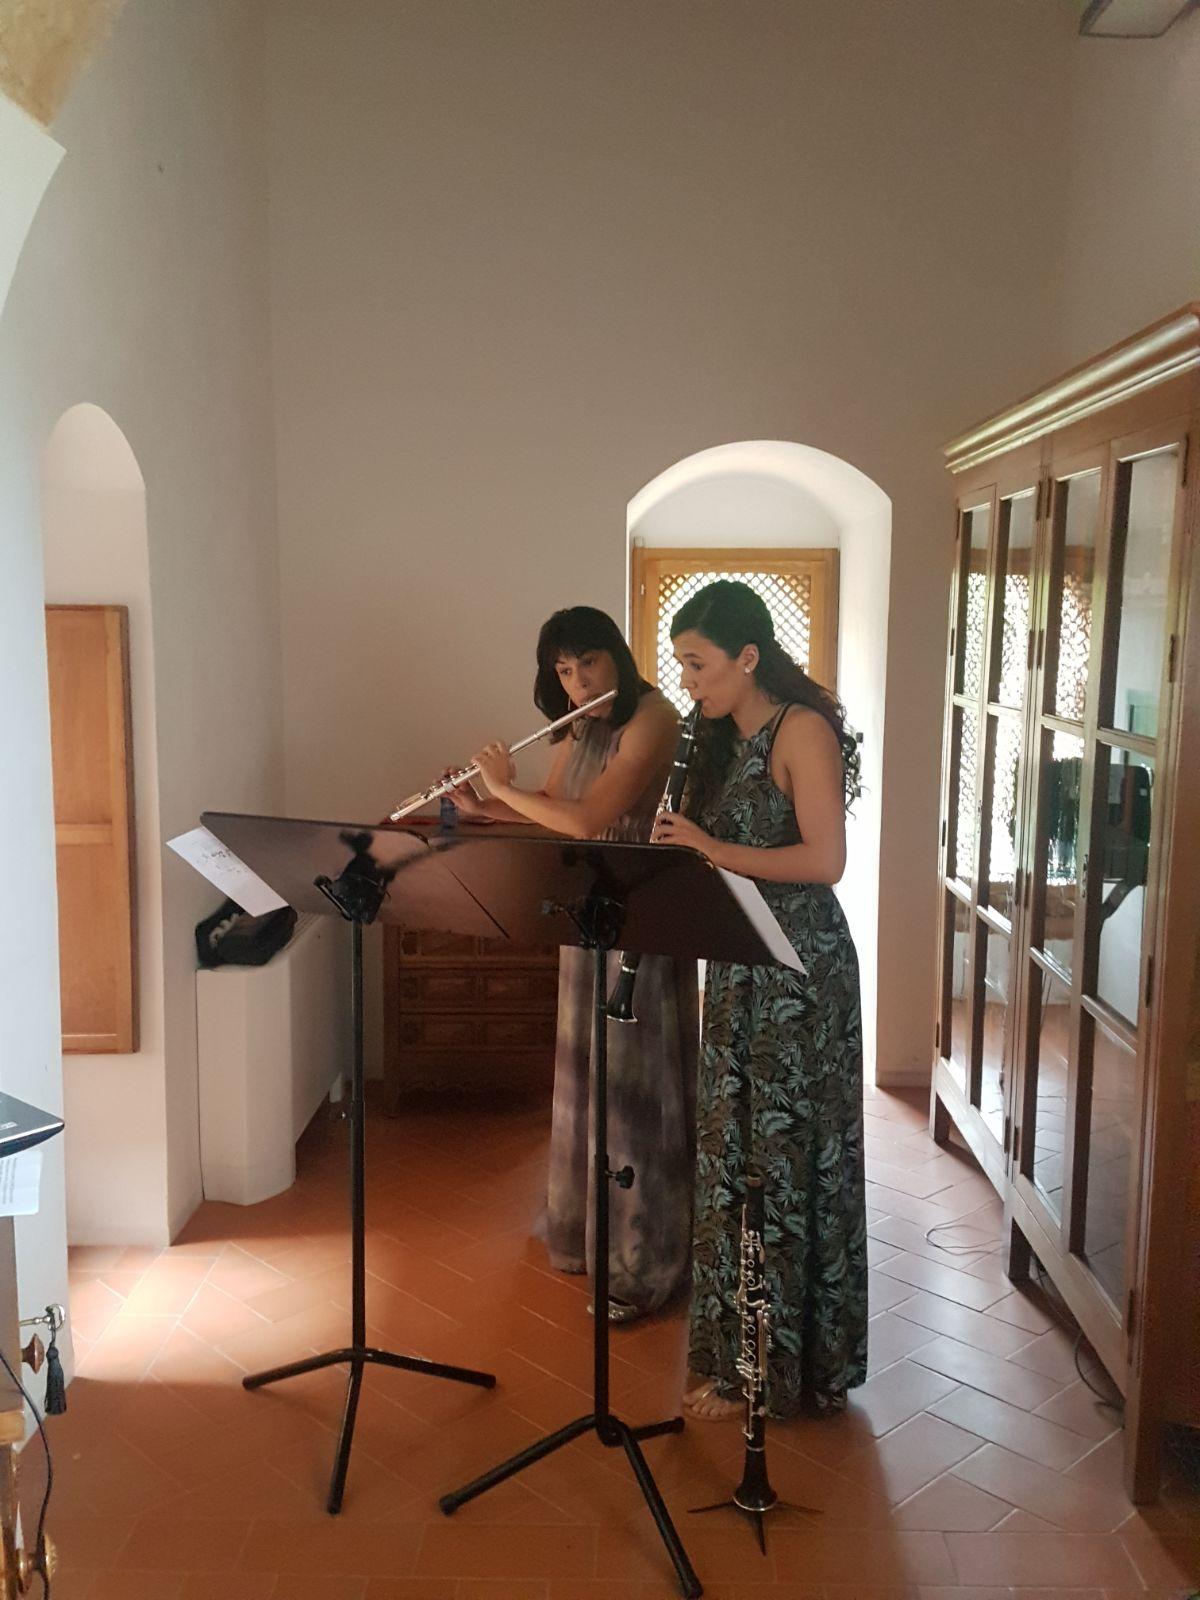 Sonidos de la Palabra. Irene Morato, Natalia Perales.